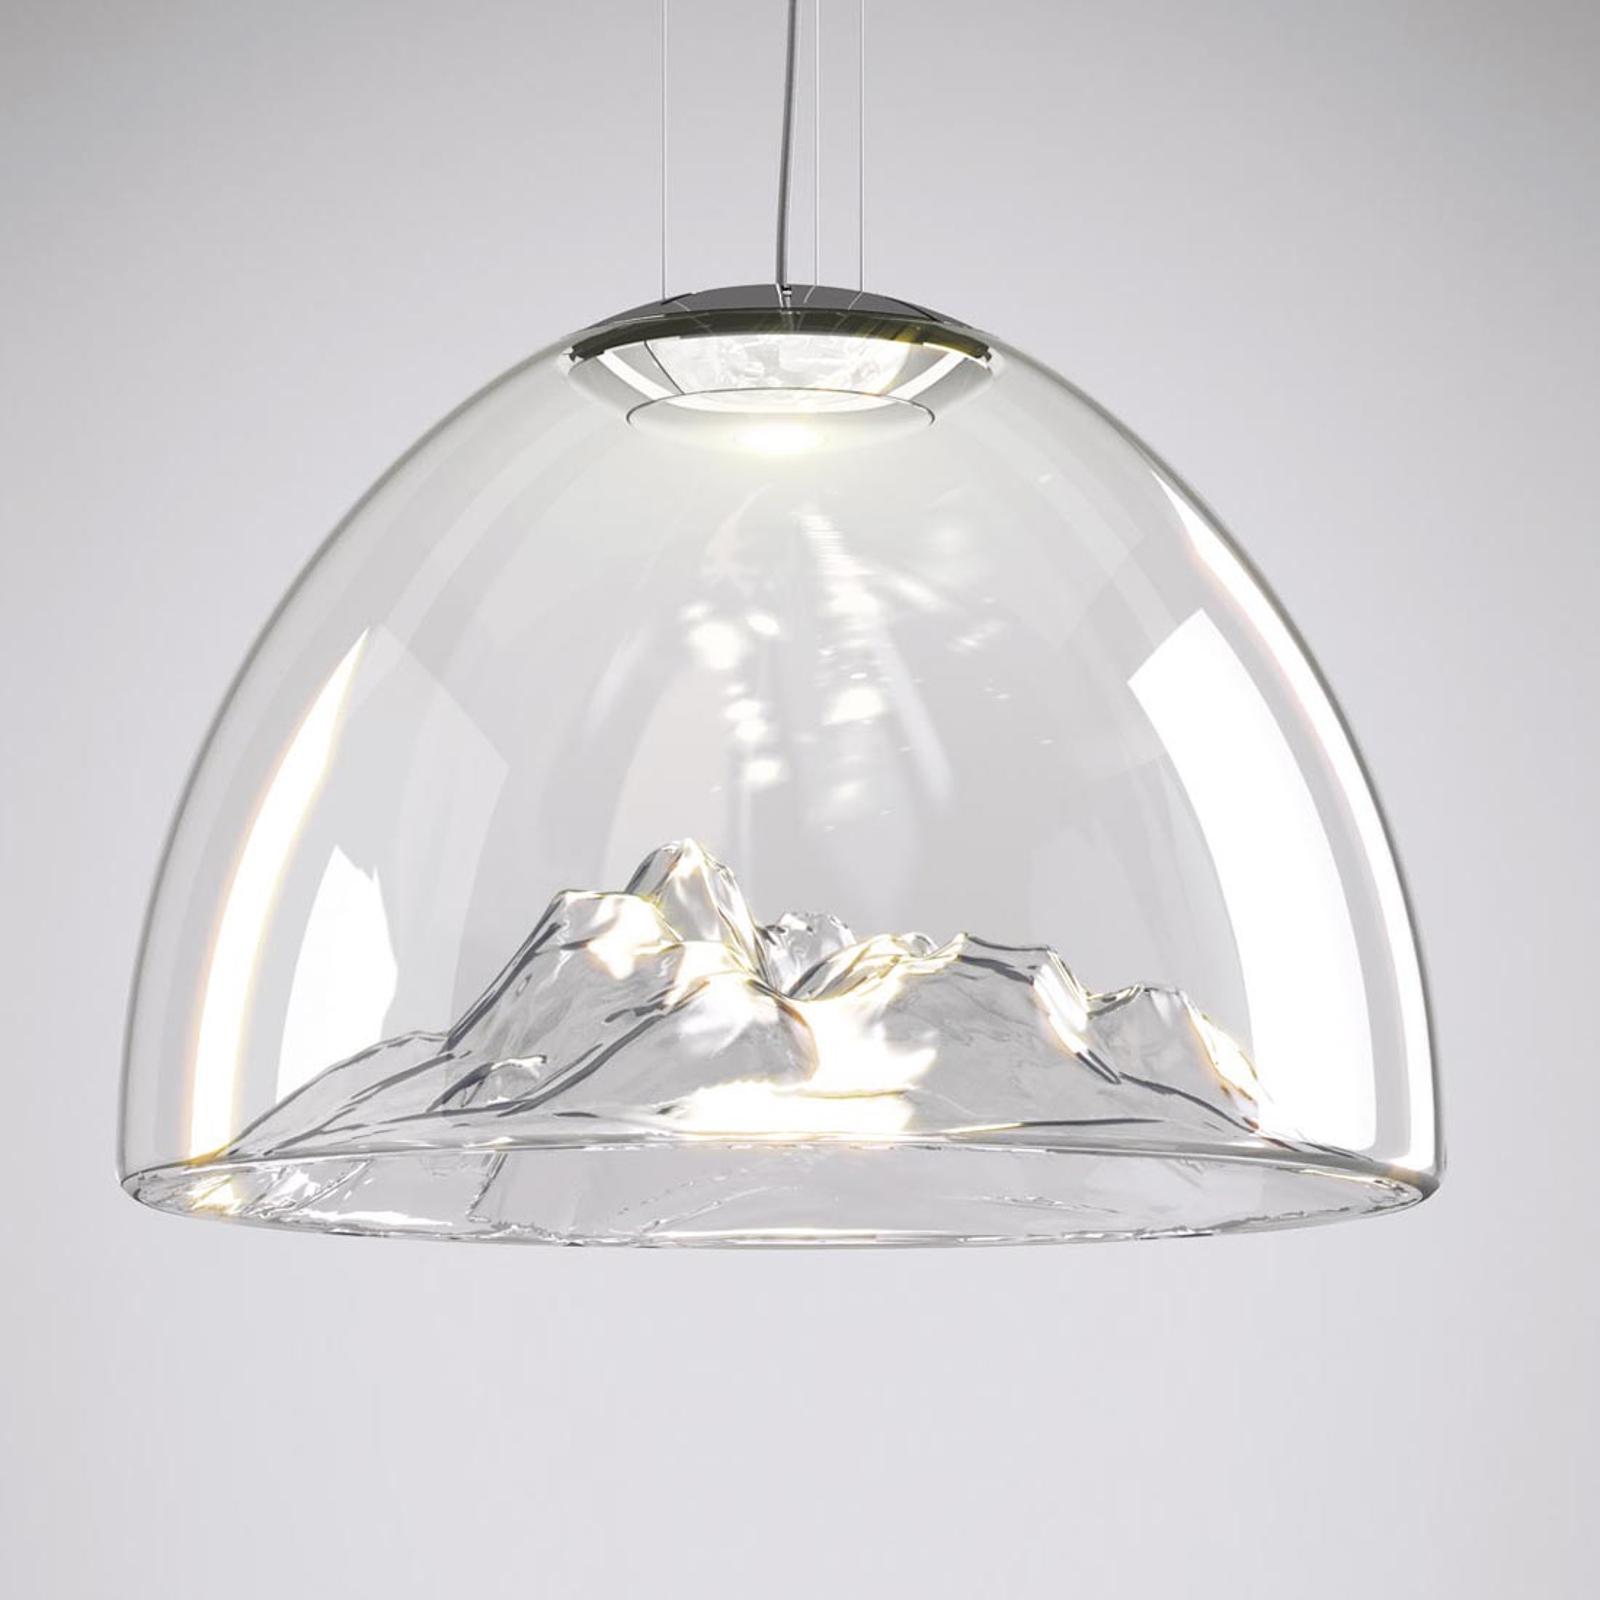 Axolight Mountain View lampe transparent-chromé